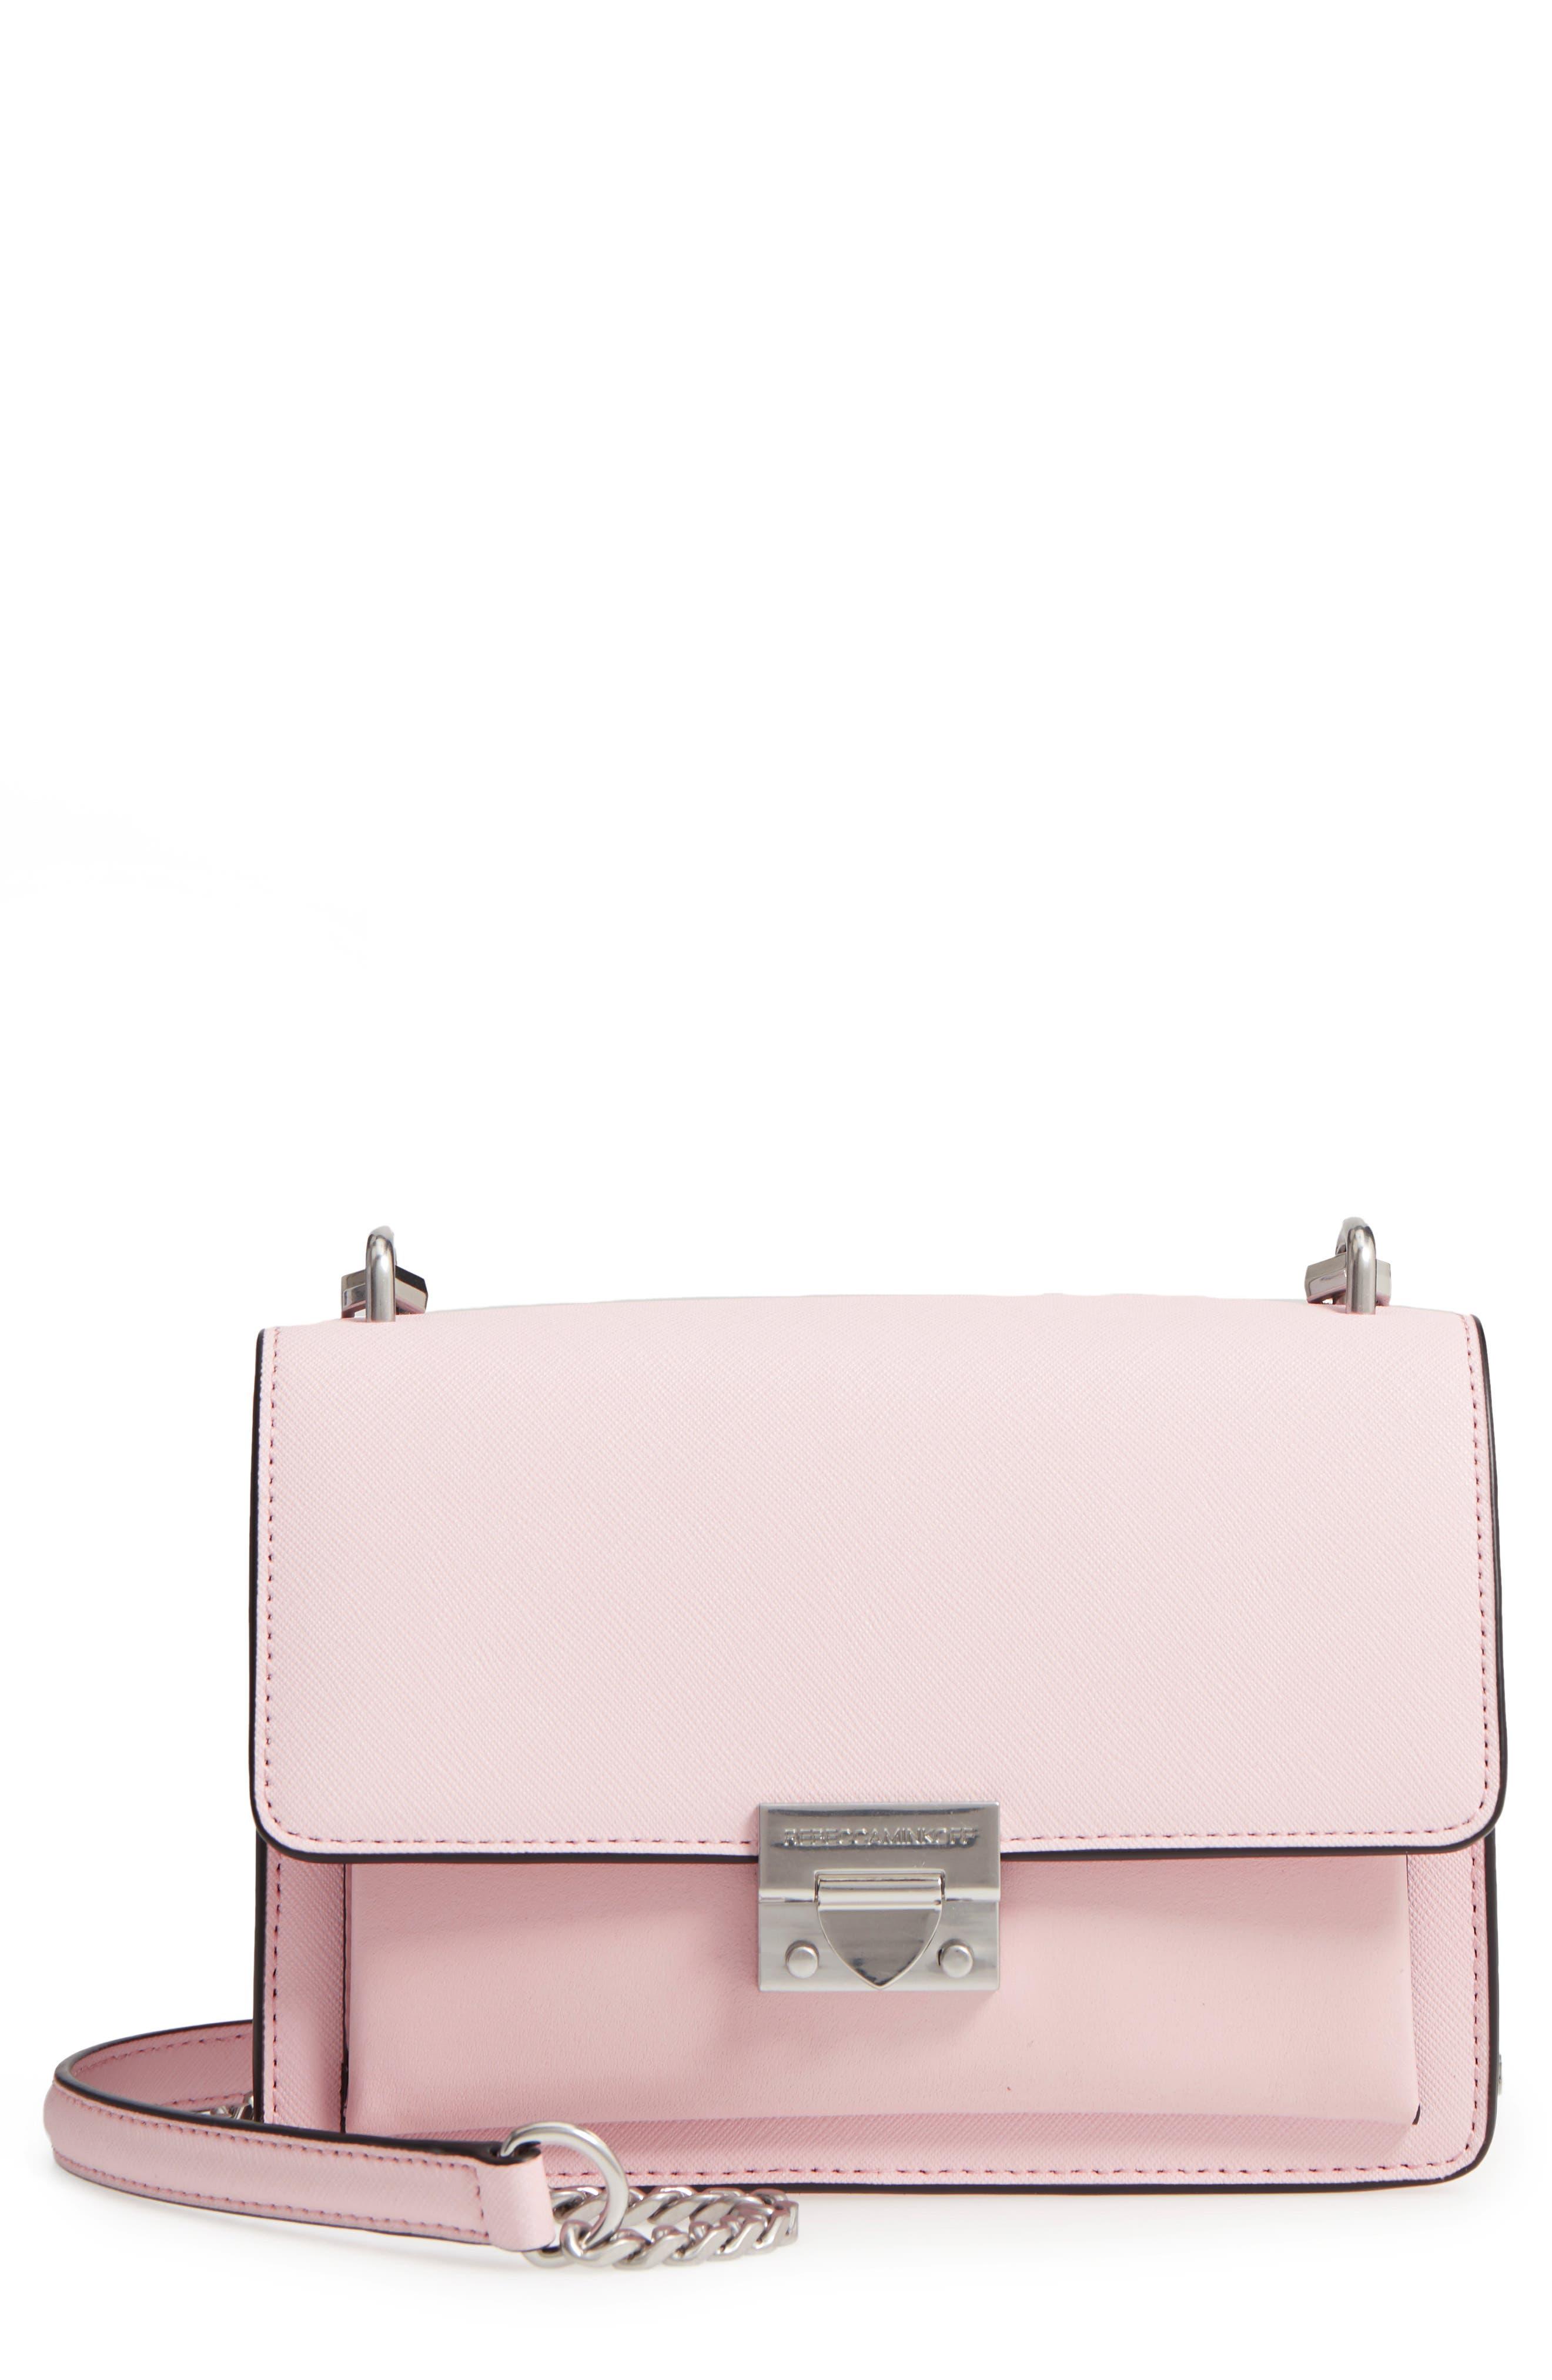 Medium Christy Leather Shoulder Bag,                             Main thumbnail 5, color,